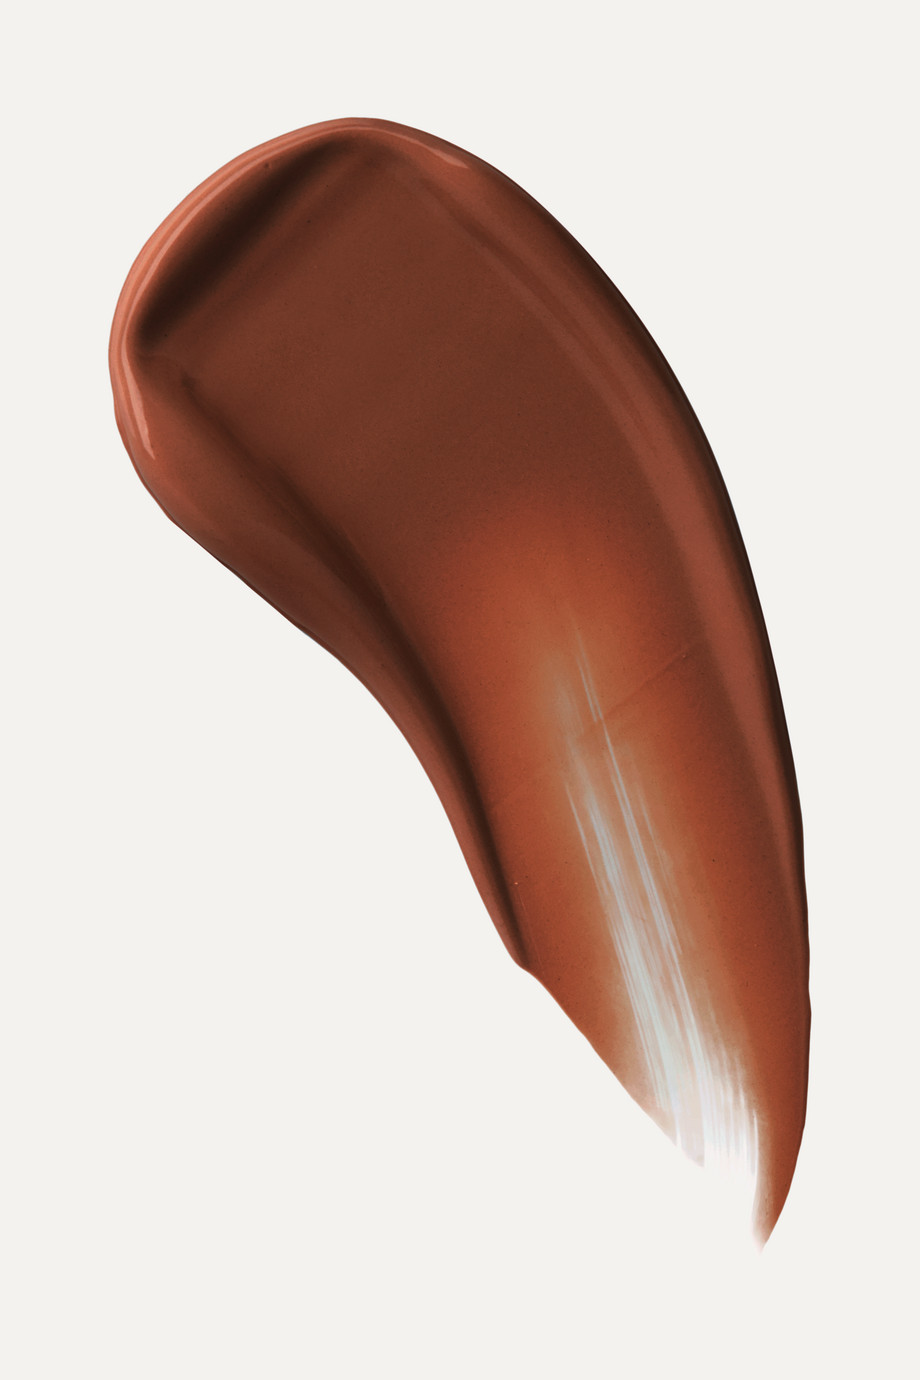 Charlotte Tilbury Magic Foundation Flawless Long-Lasting Coverage SPF15 - Shade 12, 30ml